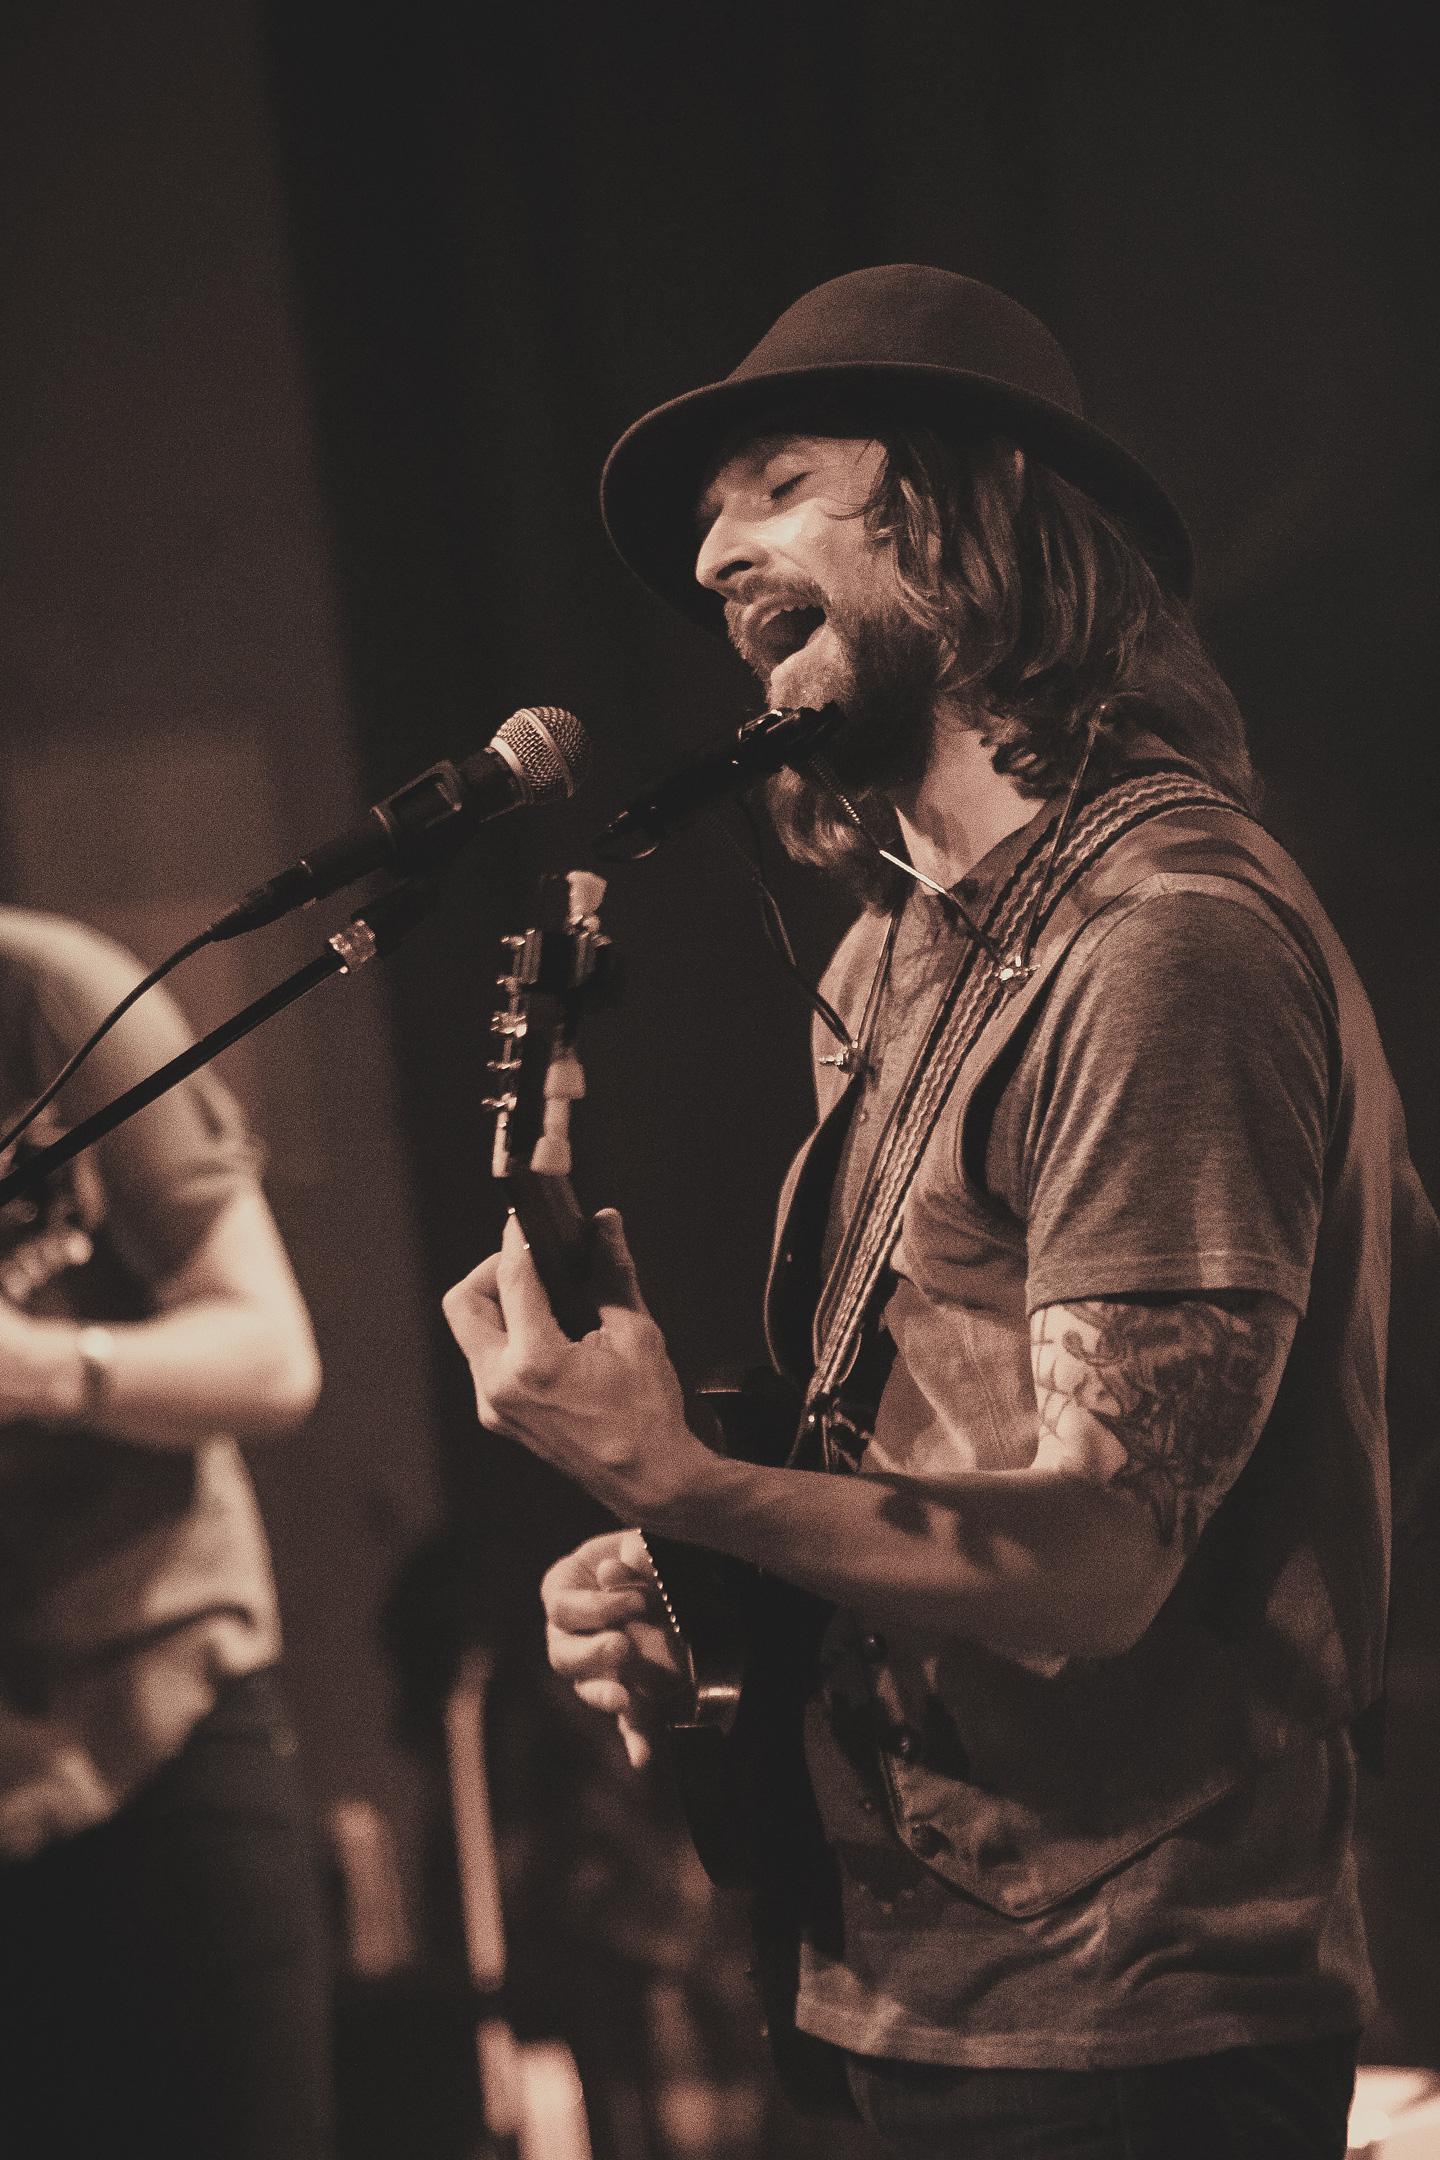 Photos of Denver bands Dragondeer and Eldren from Bluebird Theater